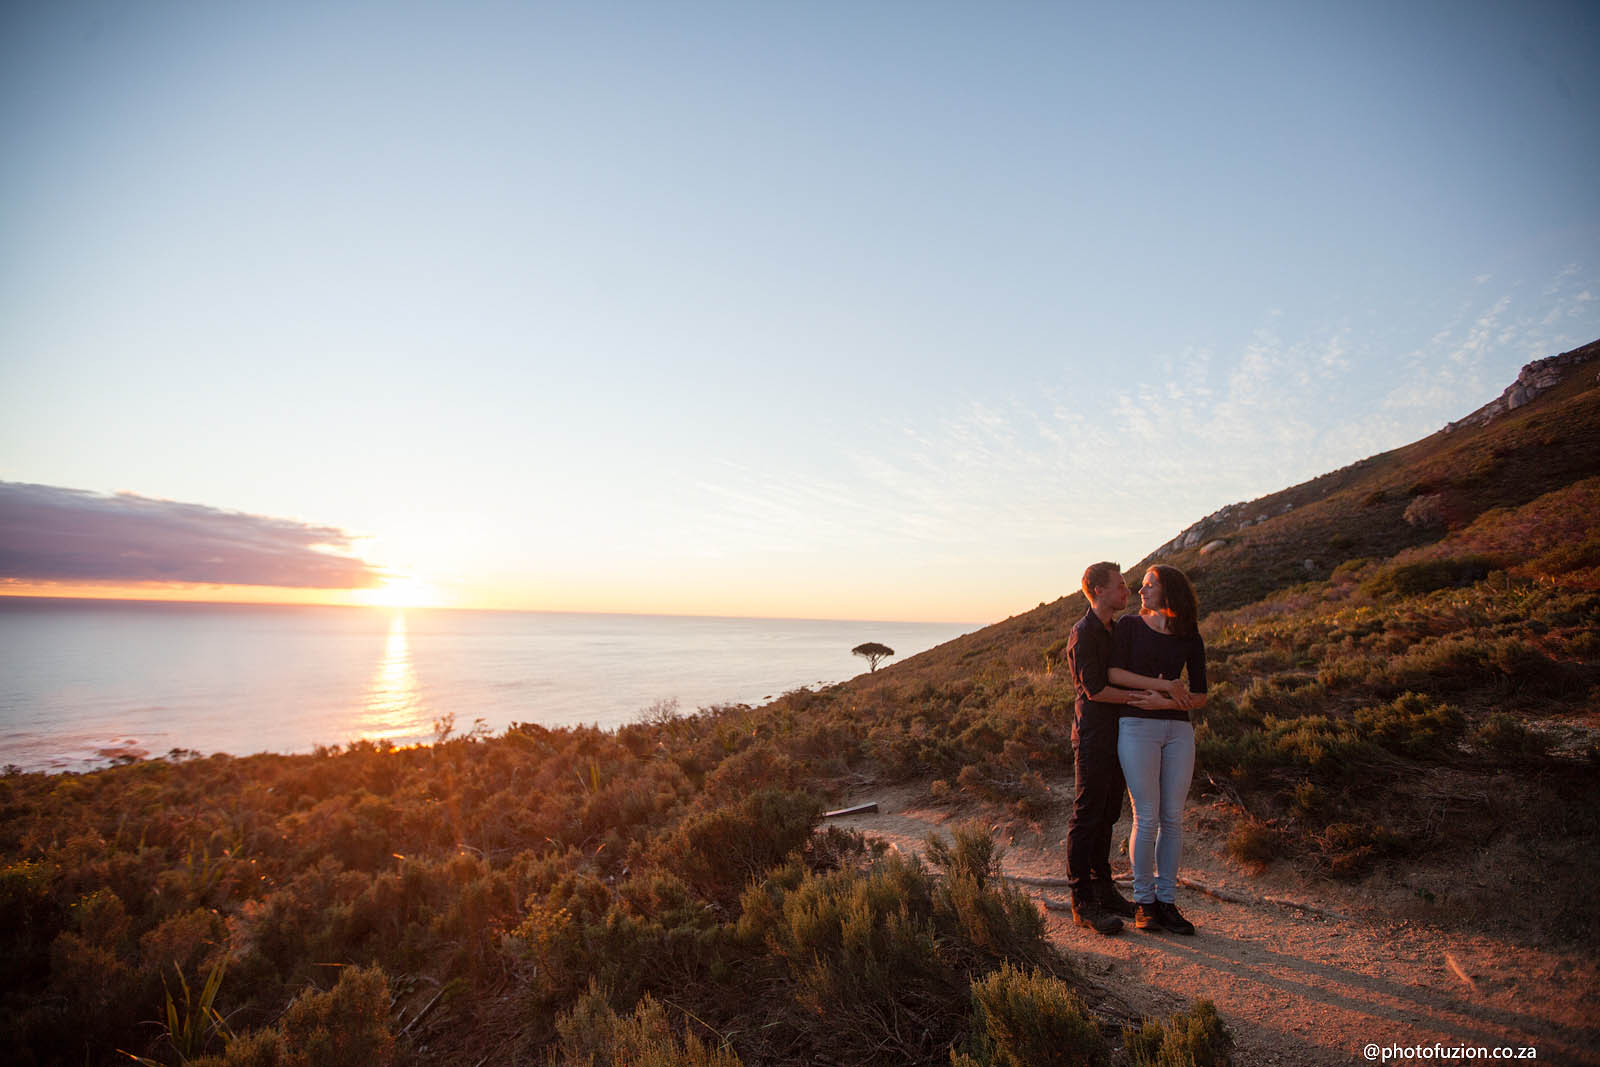 Koen and Debbie sunset proposal